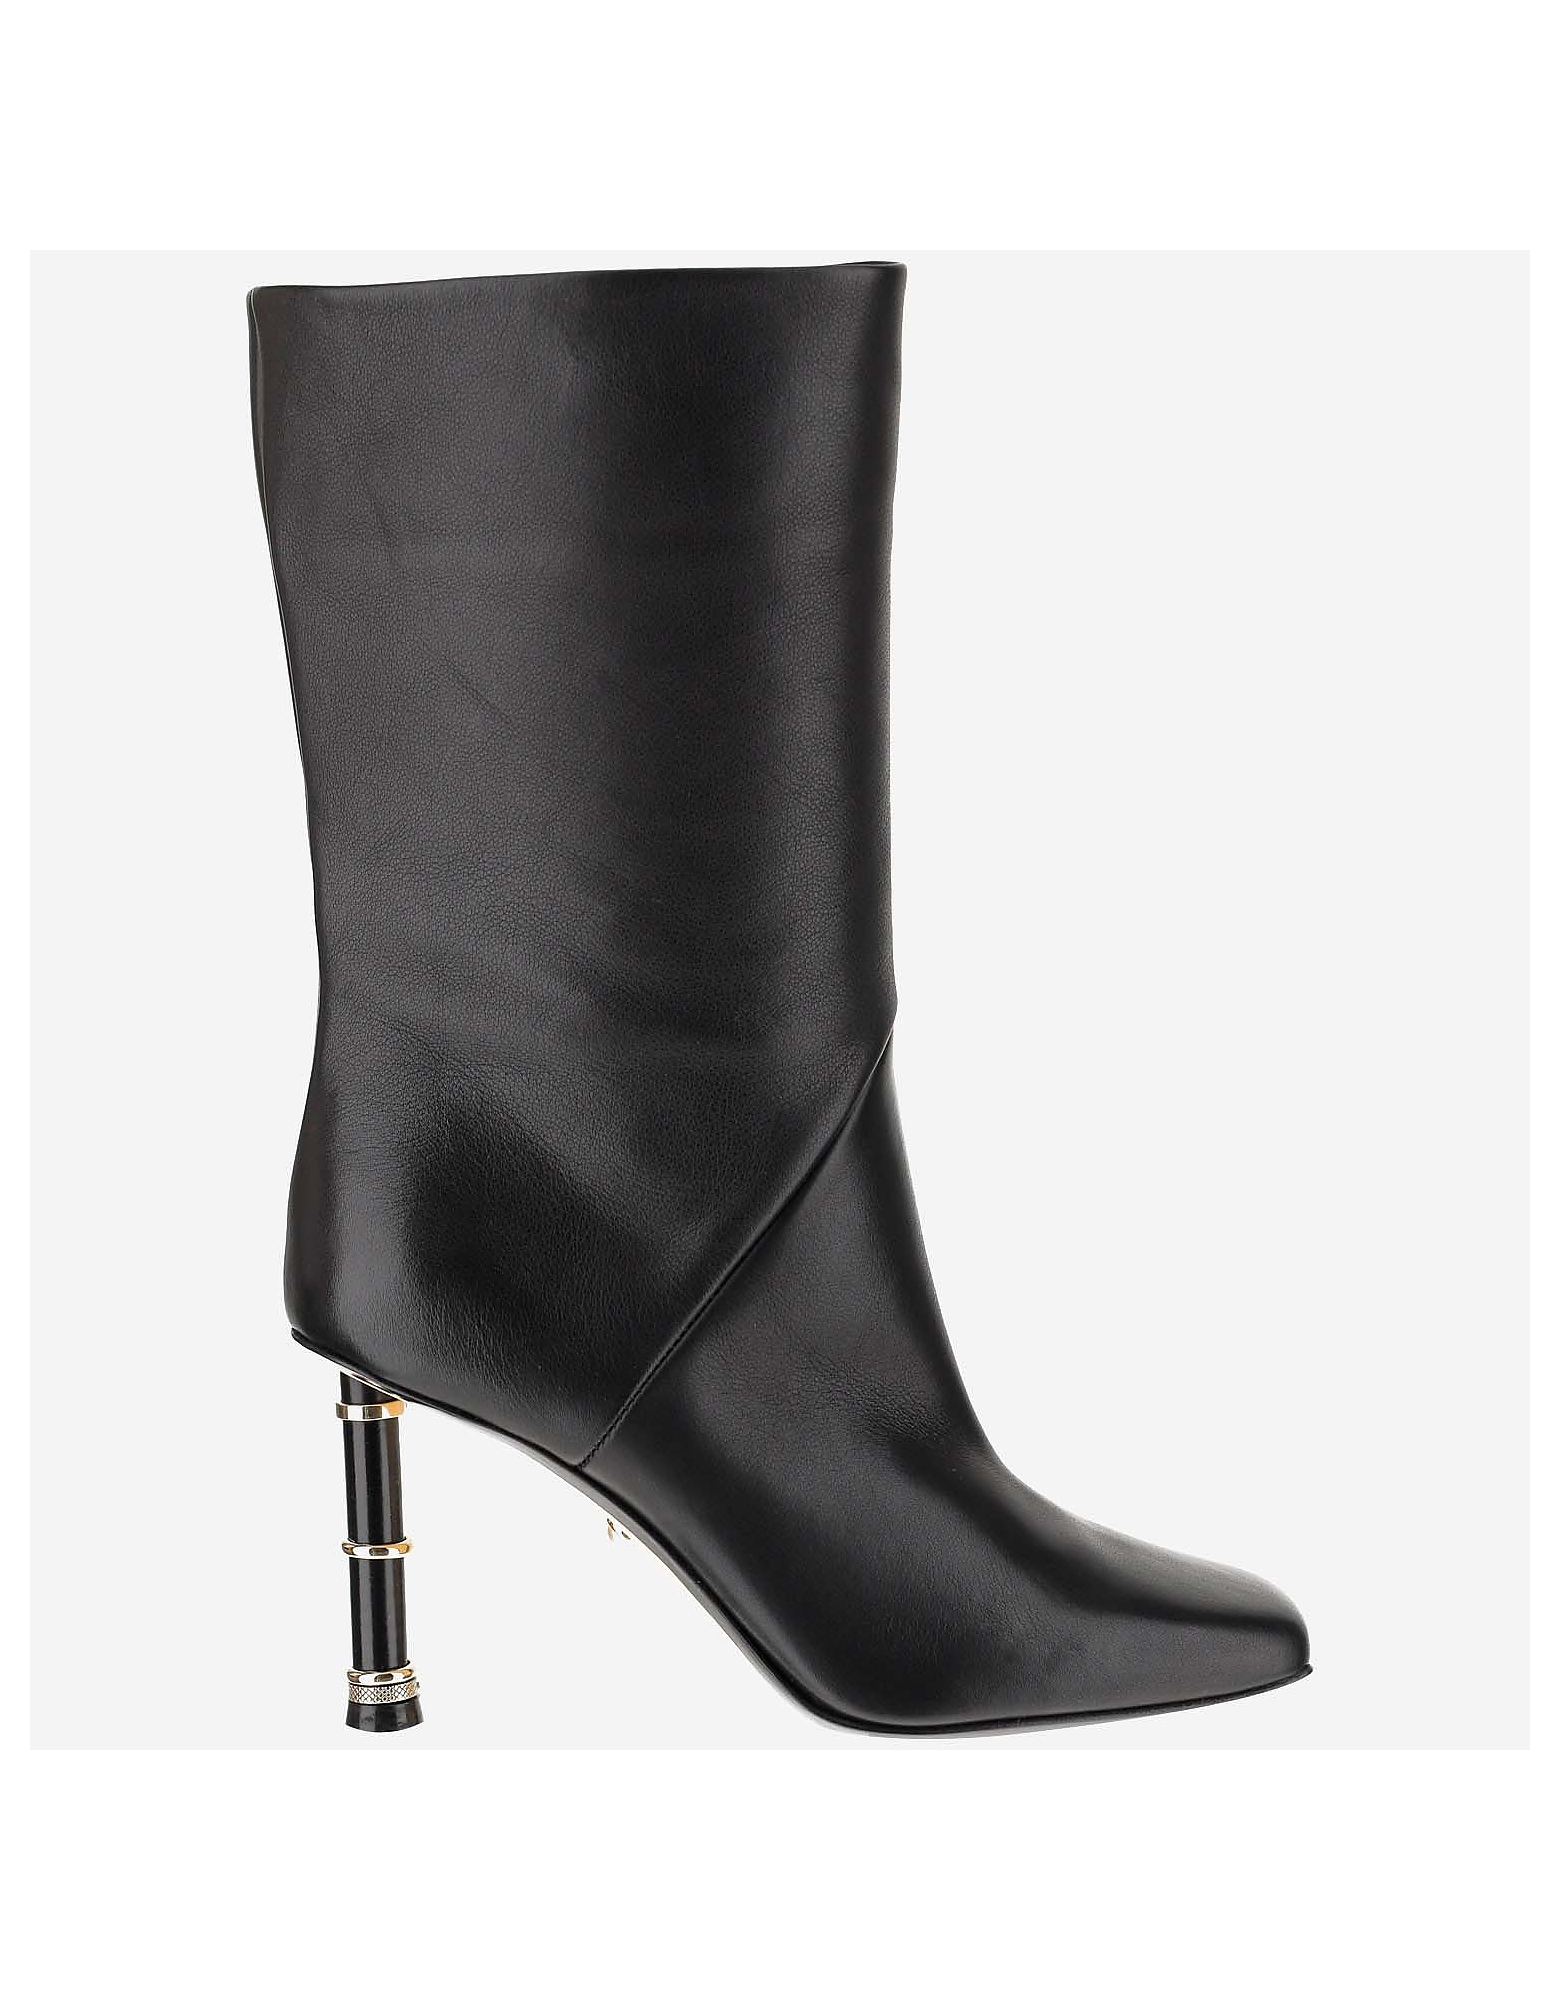 Alevi Designer Shoes, Black Leather Grace 80MM Boots